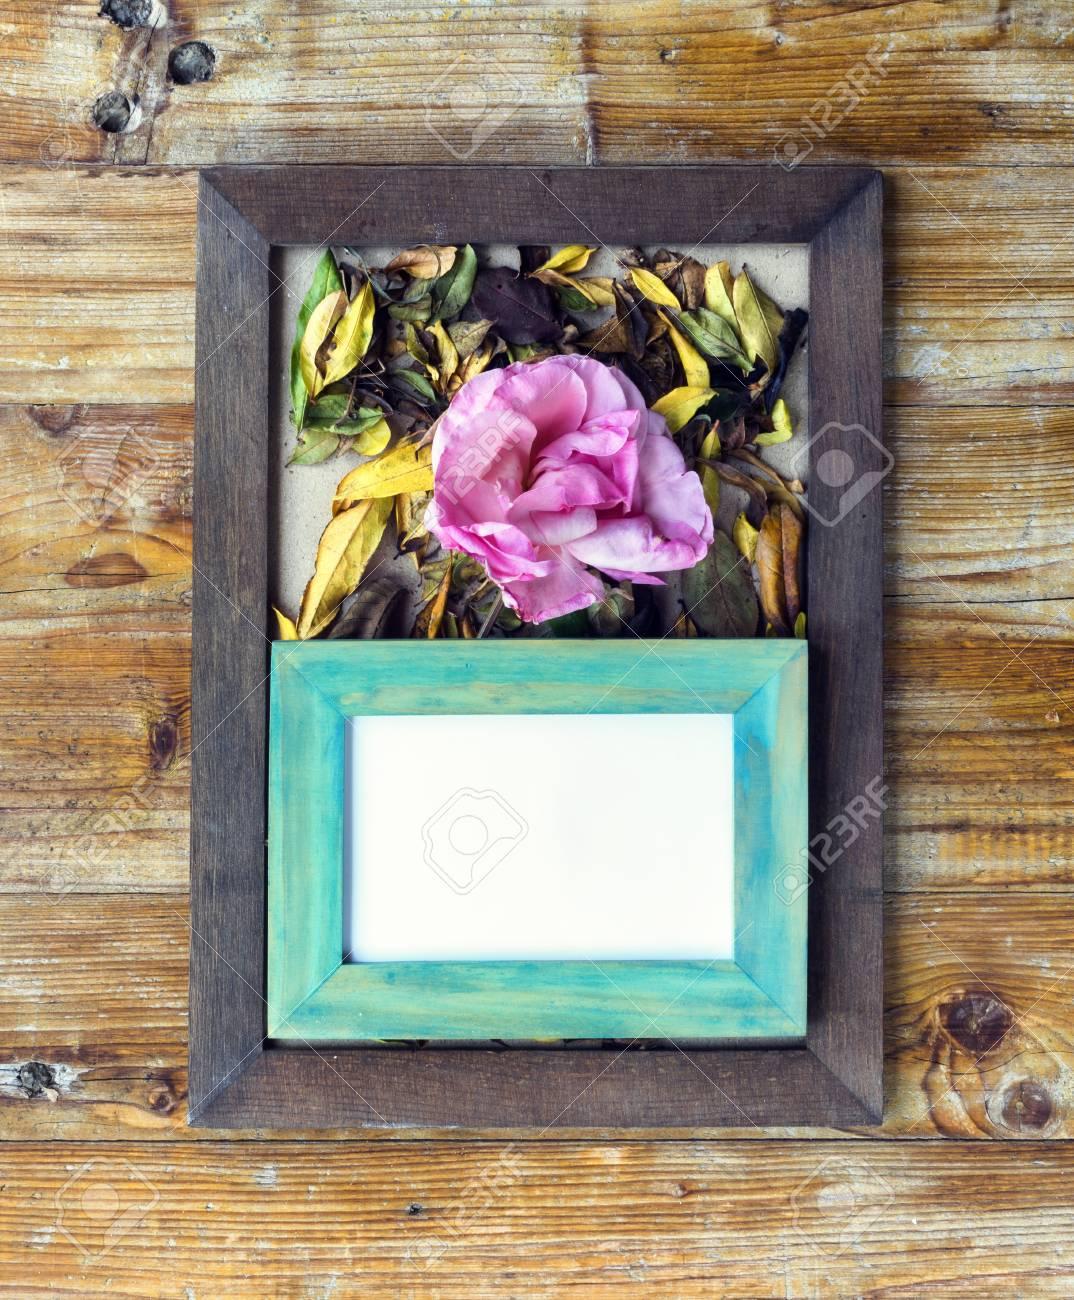 Marcos De Cuadros Concepto De Otono De Diferentes Colores Flores Y - Cuadros-diferentes